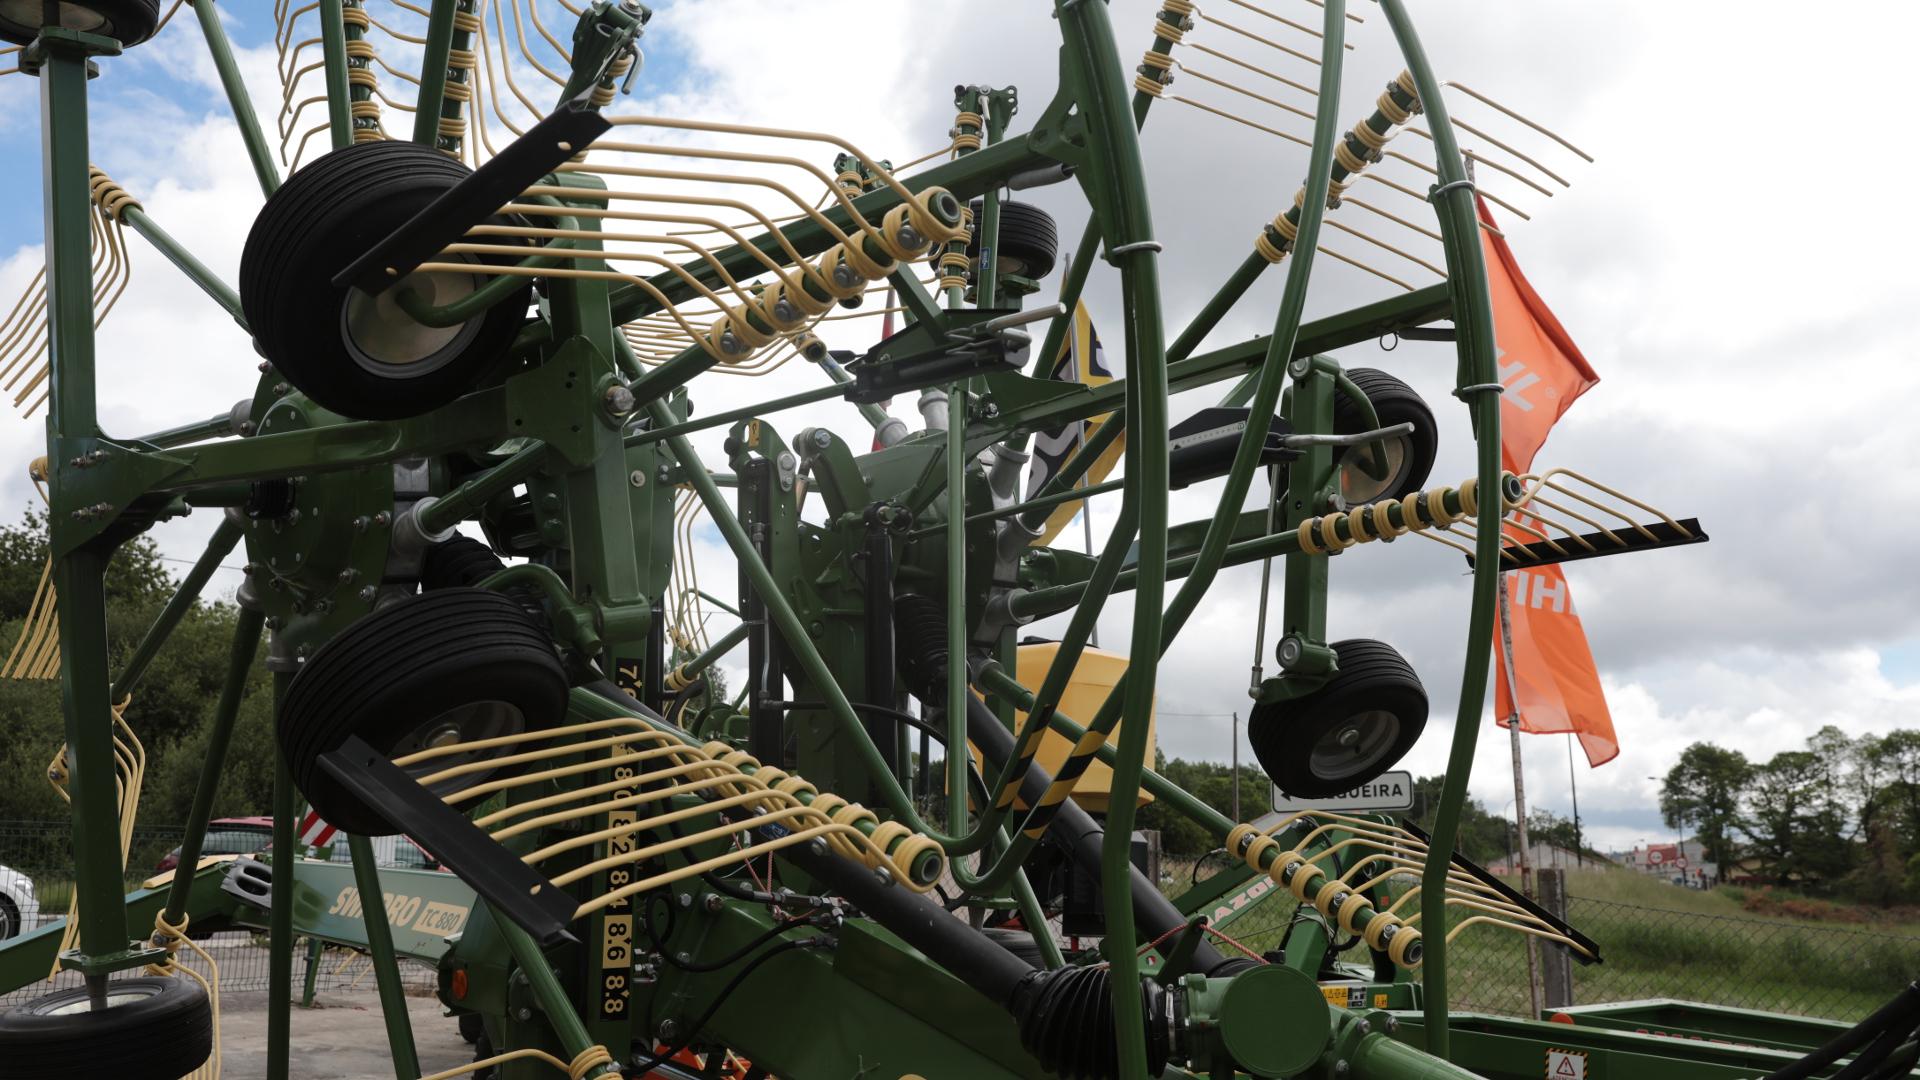 la-evolucion-de-la-maquinaria-agricola-1920